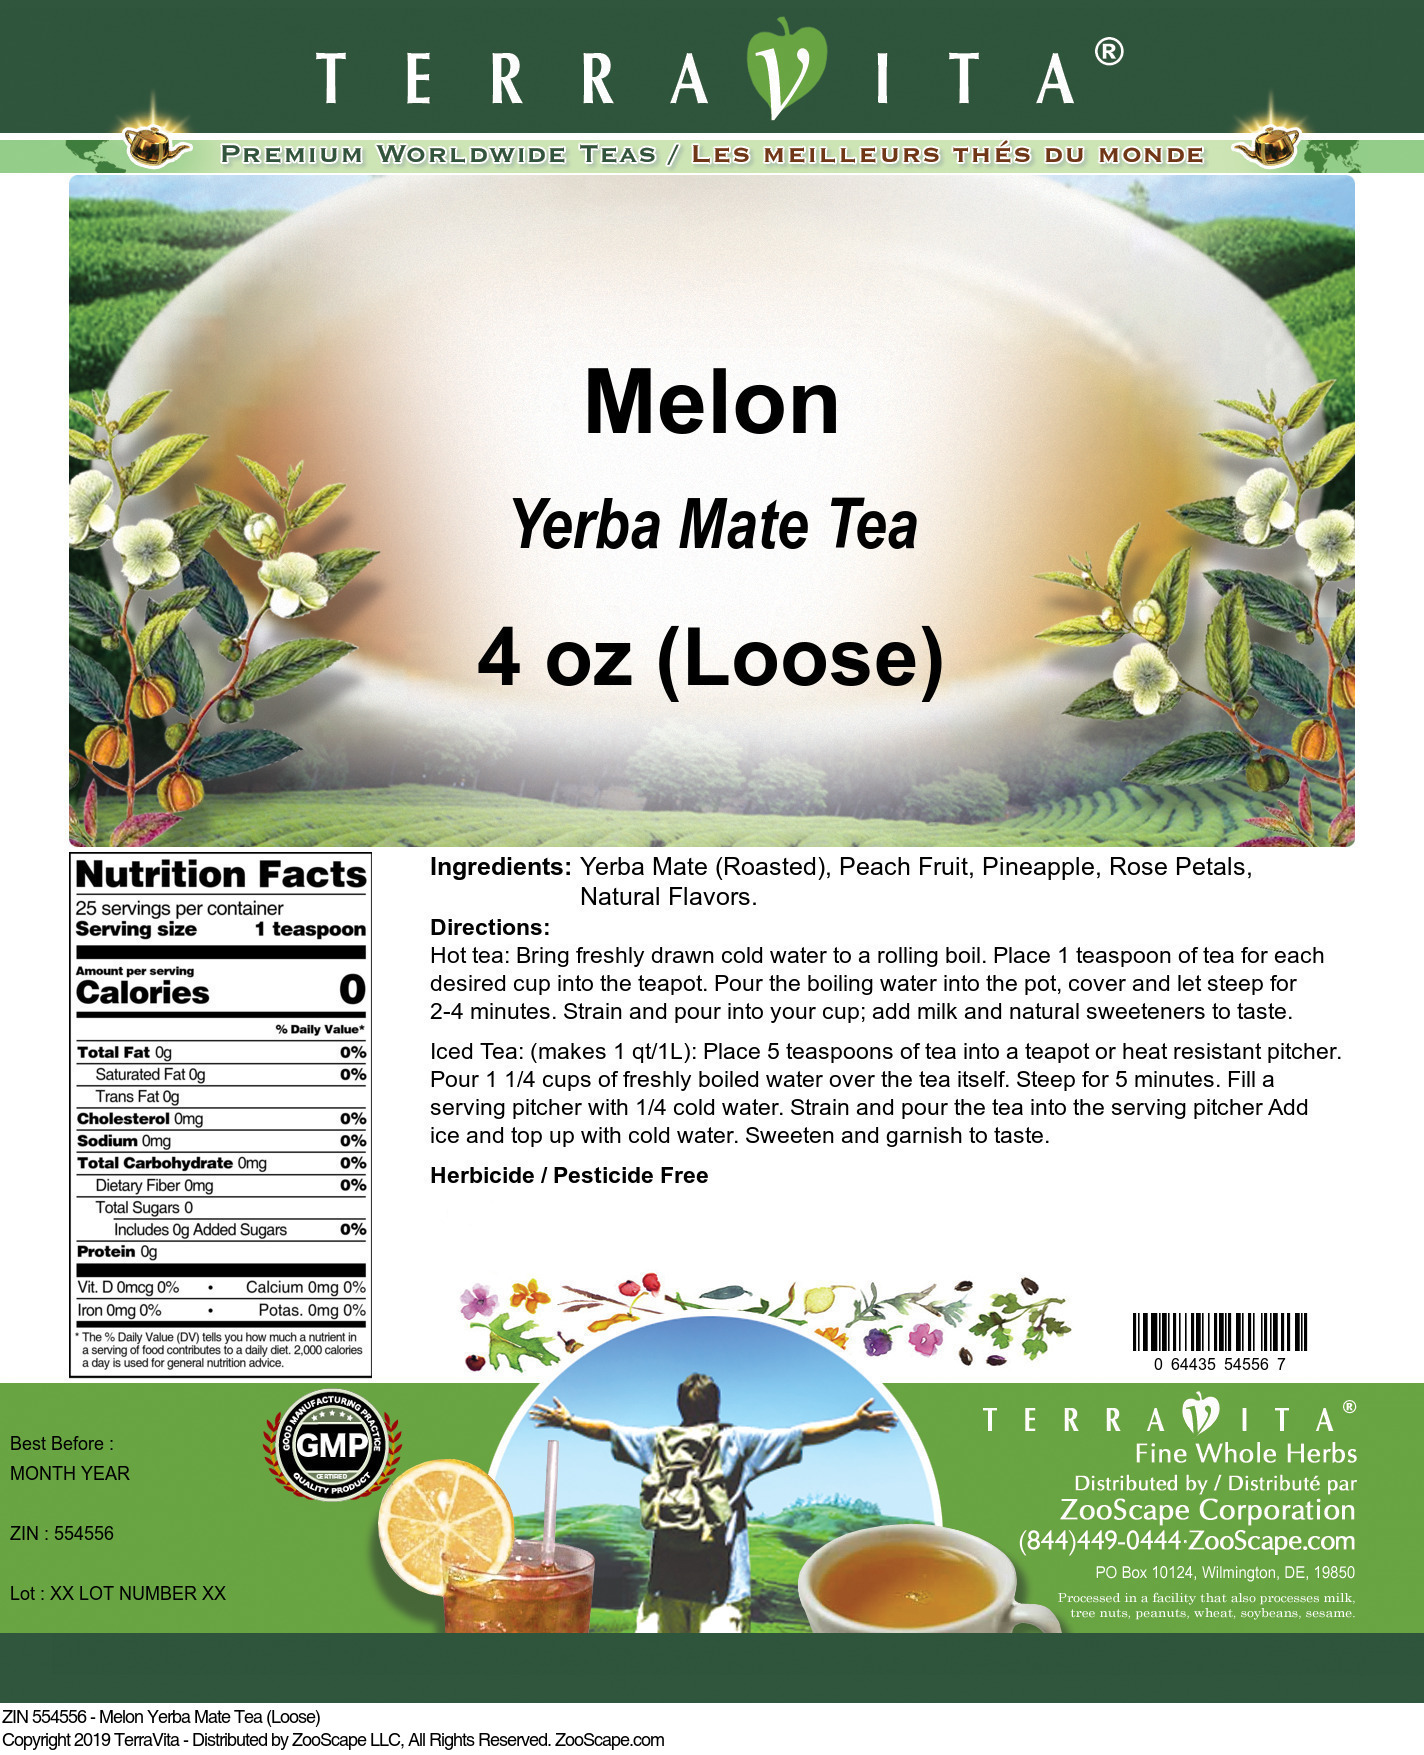 Melon Yerba Mate Tea (Loose)